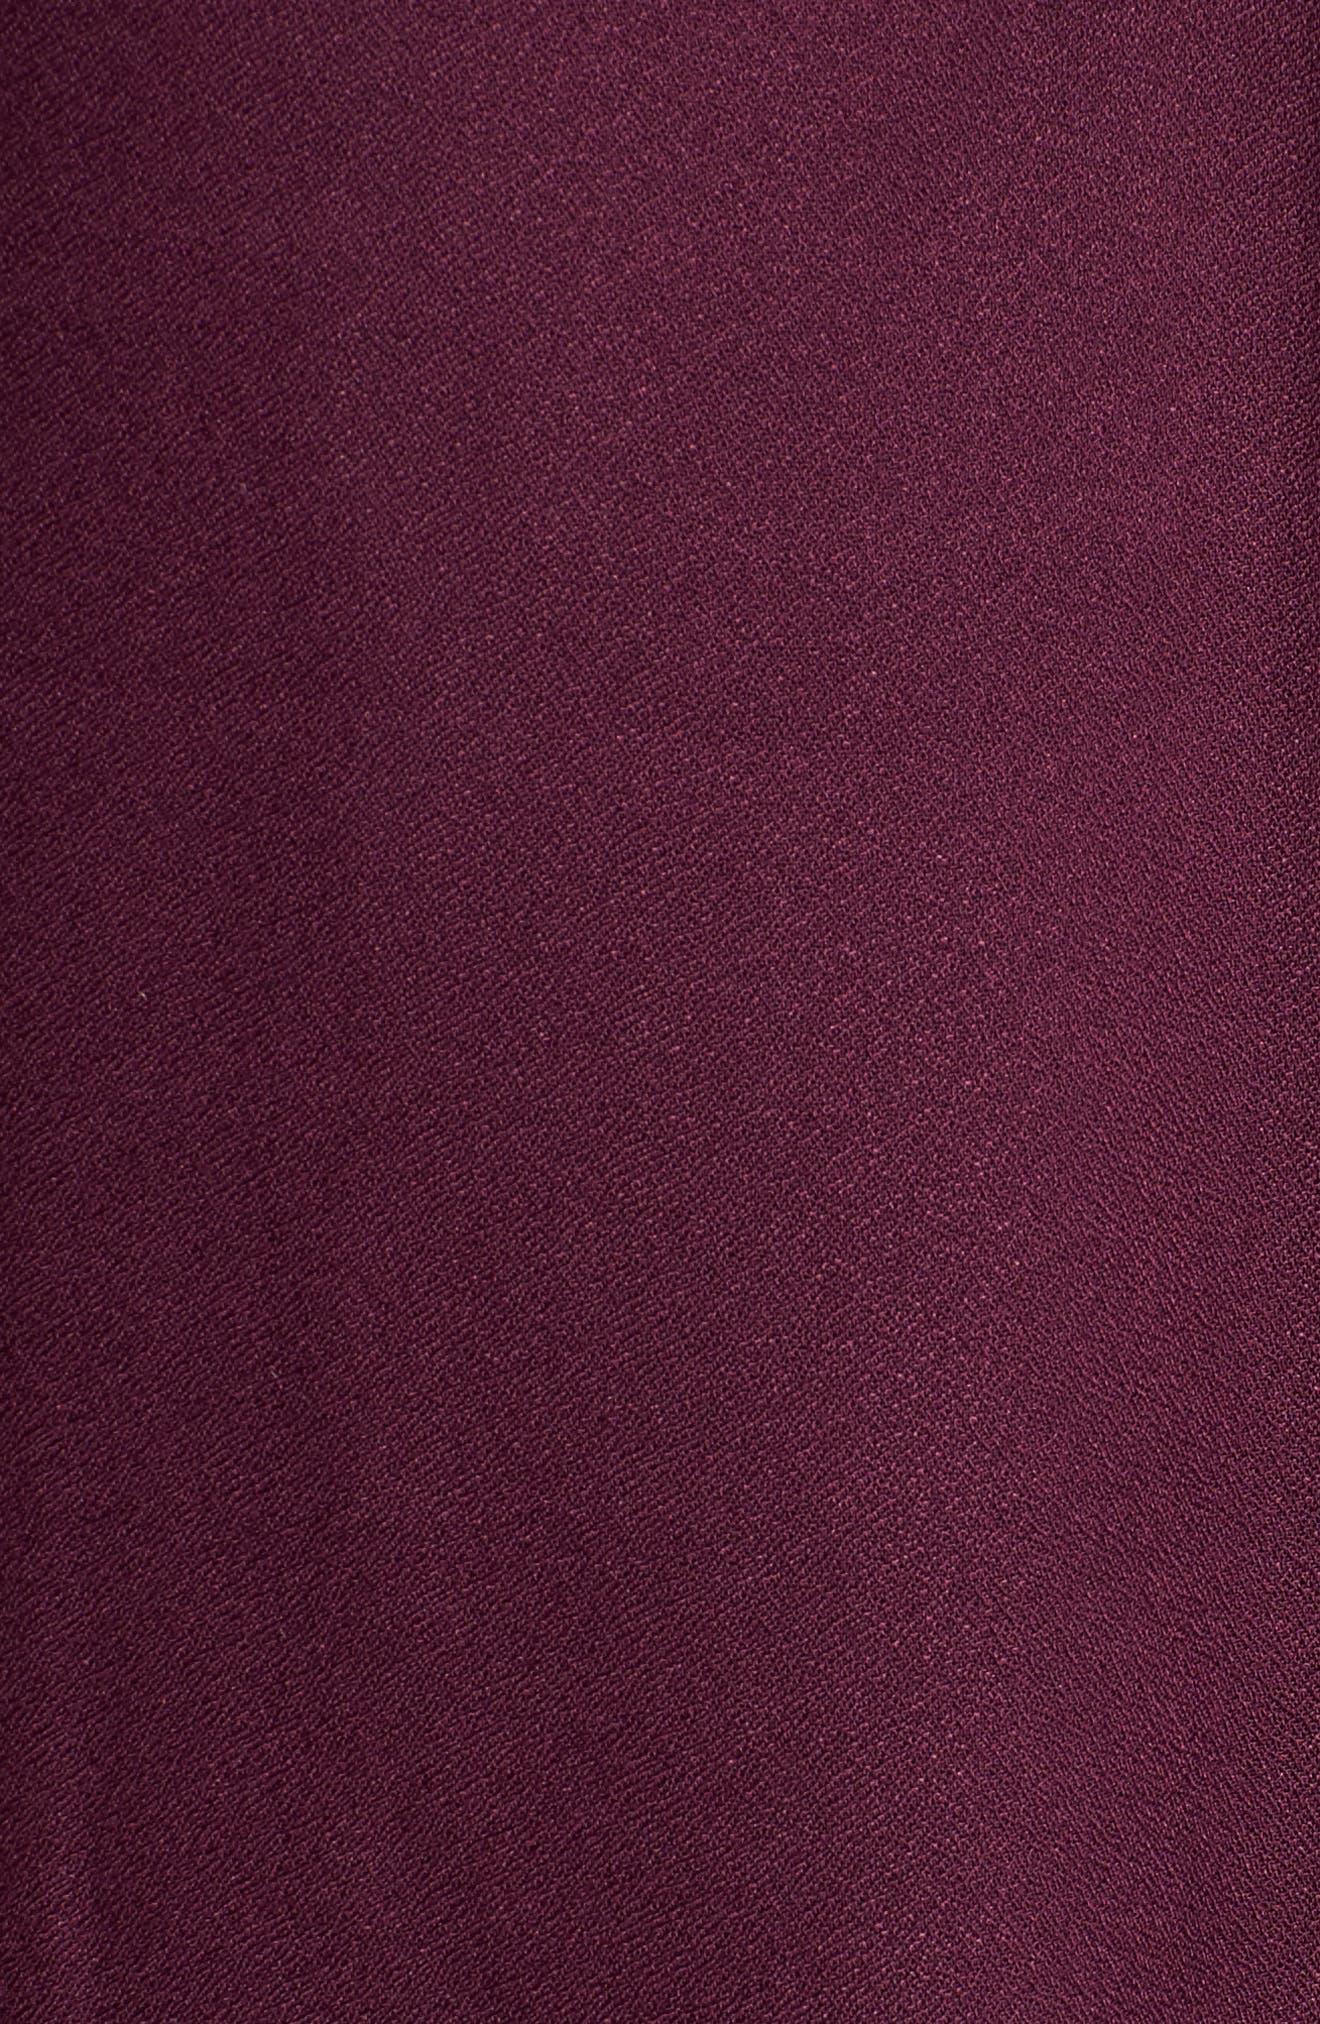 Blouson Sleeve Top,                             Alternate thumbnail 28, color,